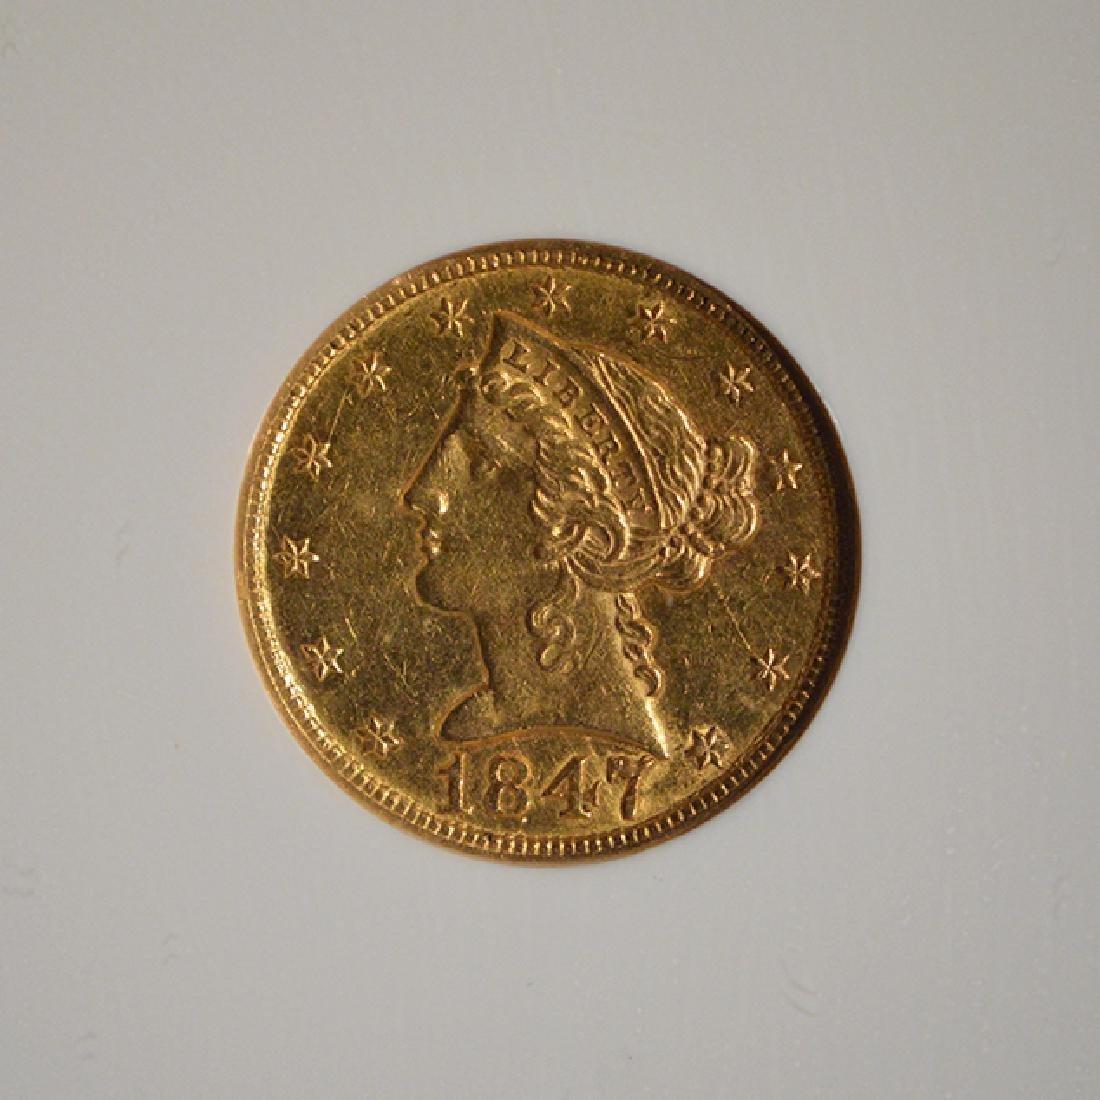 1847 $5 Liberty Head Half Eagle Gold Coin NGC AU58 - 3